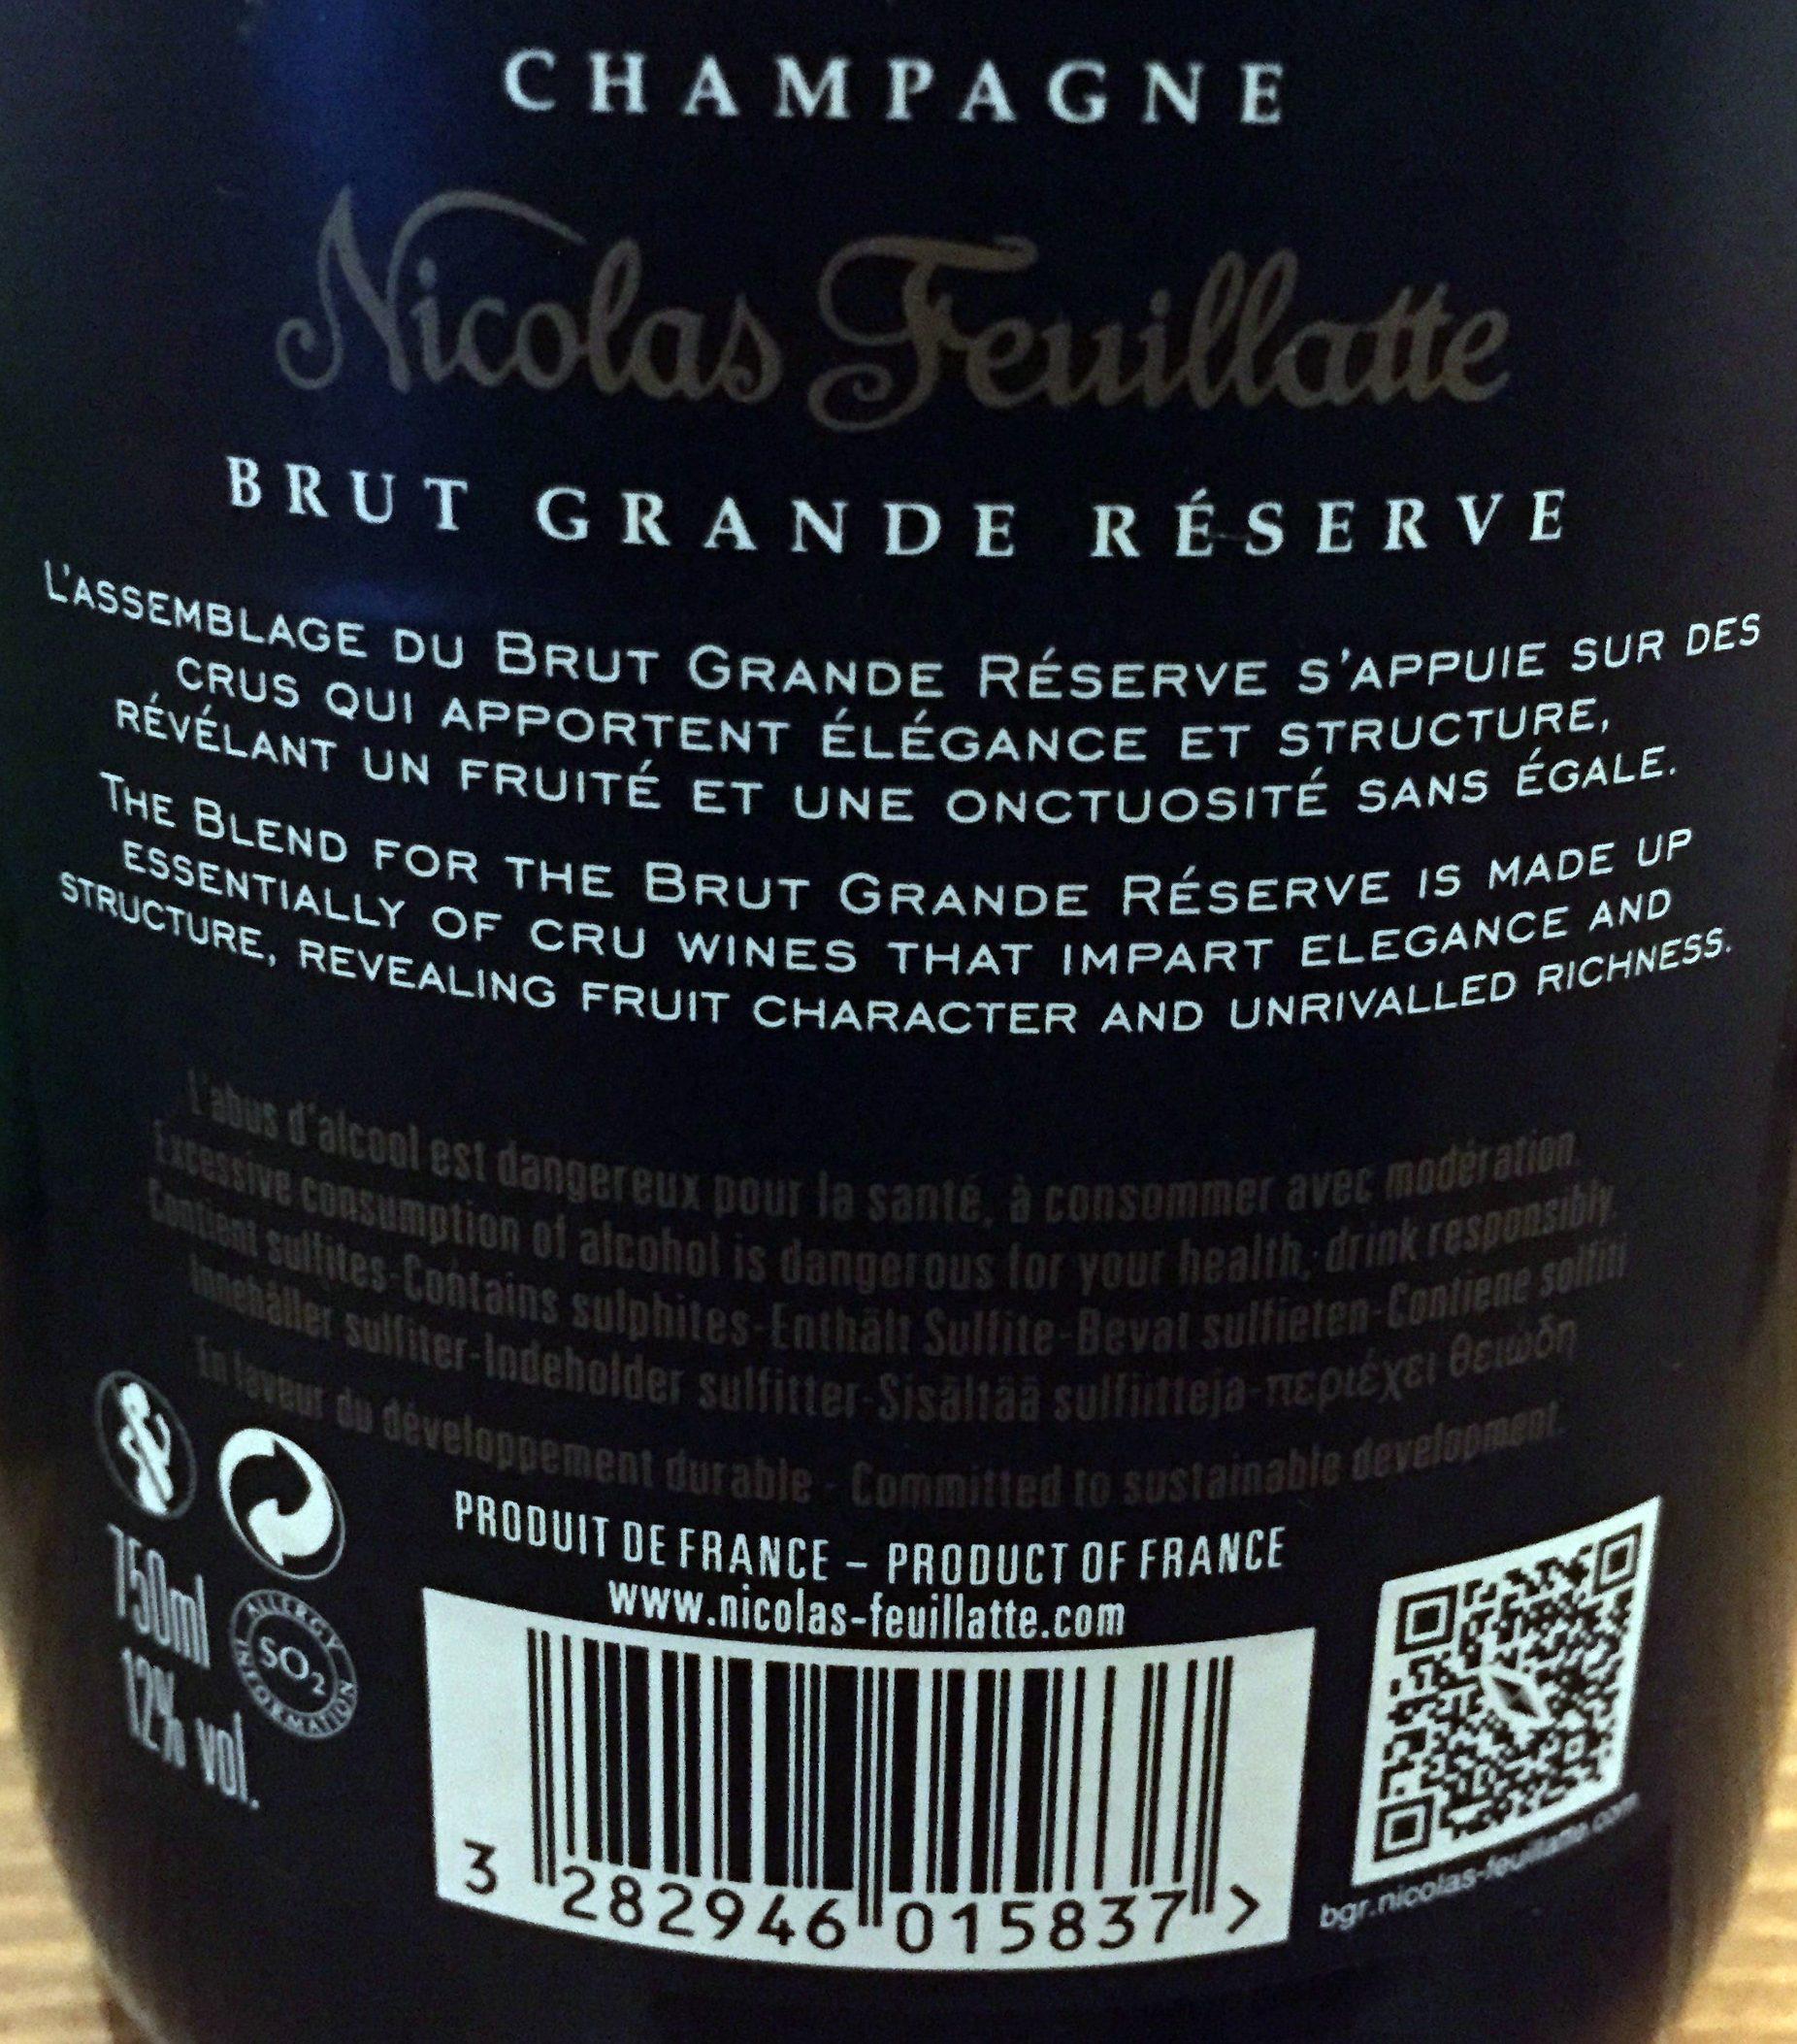 Brut Grande Réserve - Ingrediënten